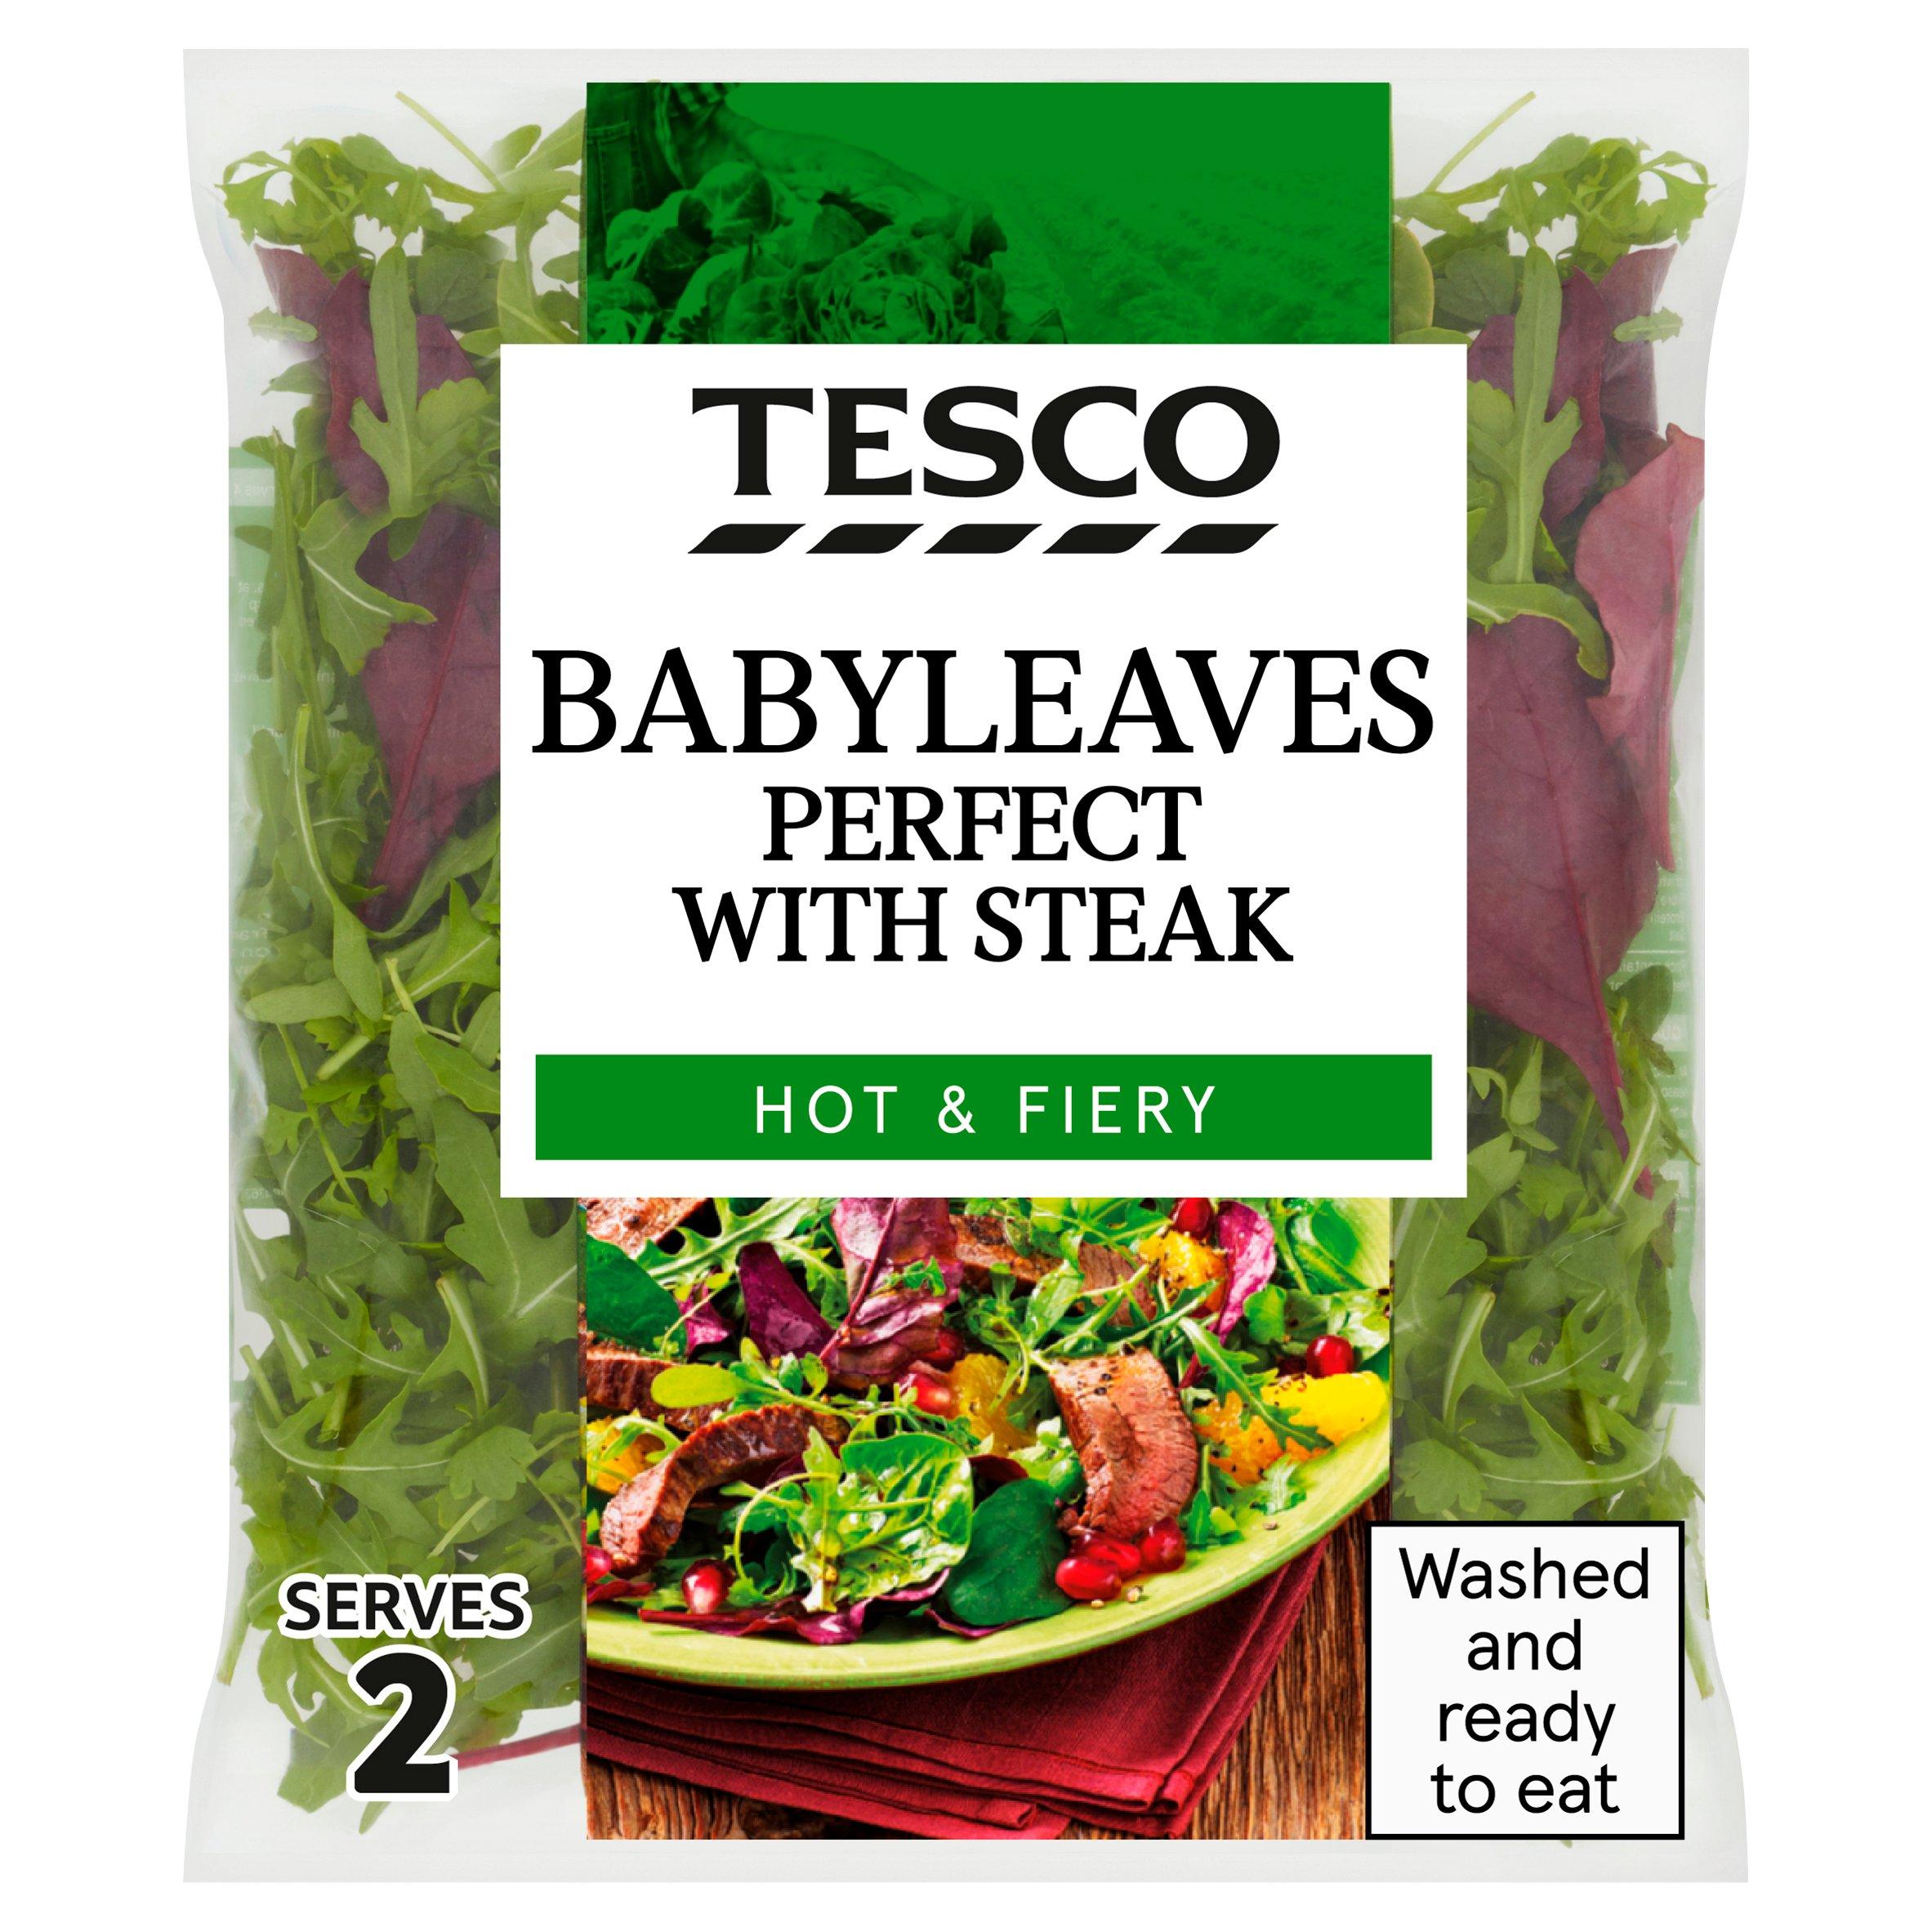 Tesco Babyleaves Perfect Steak Hot & Fiery 70G